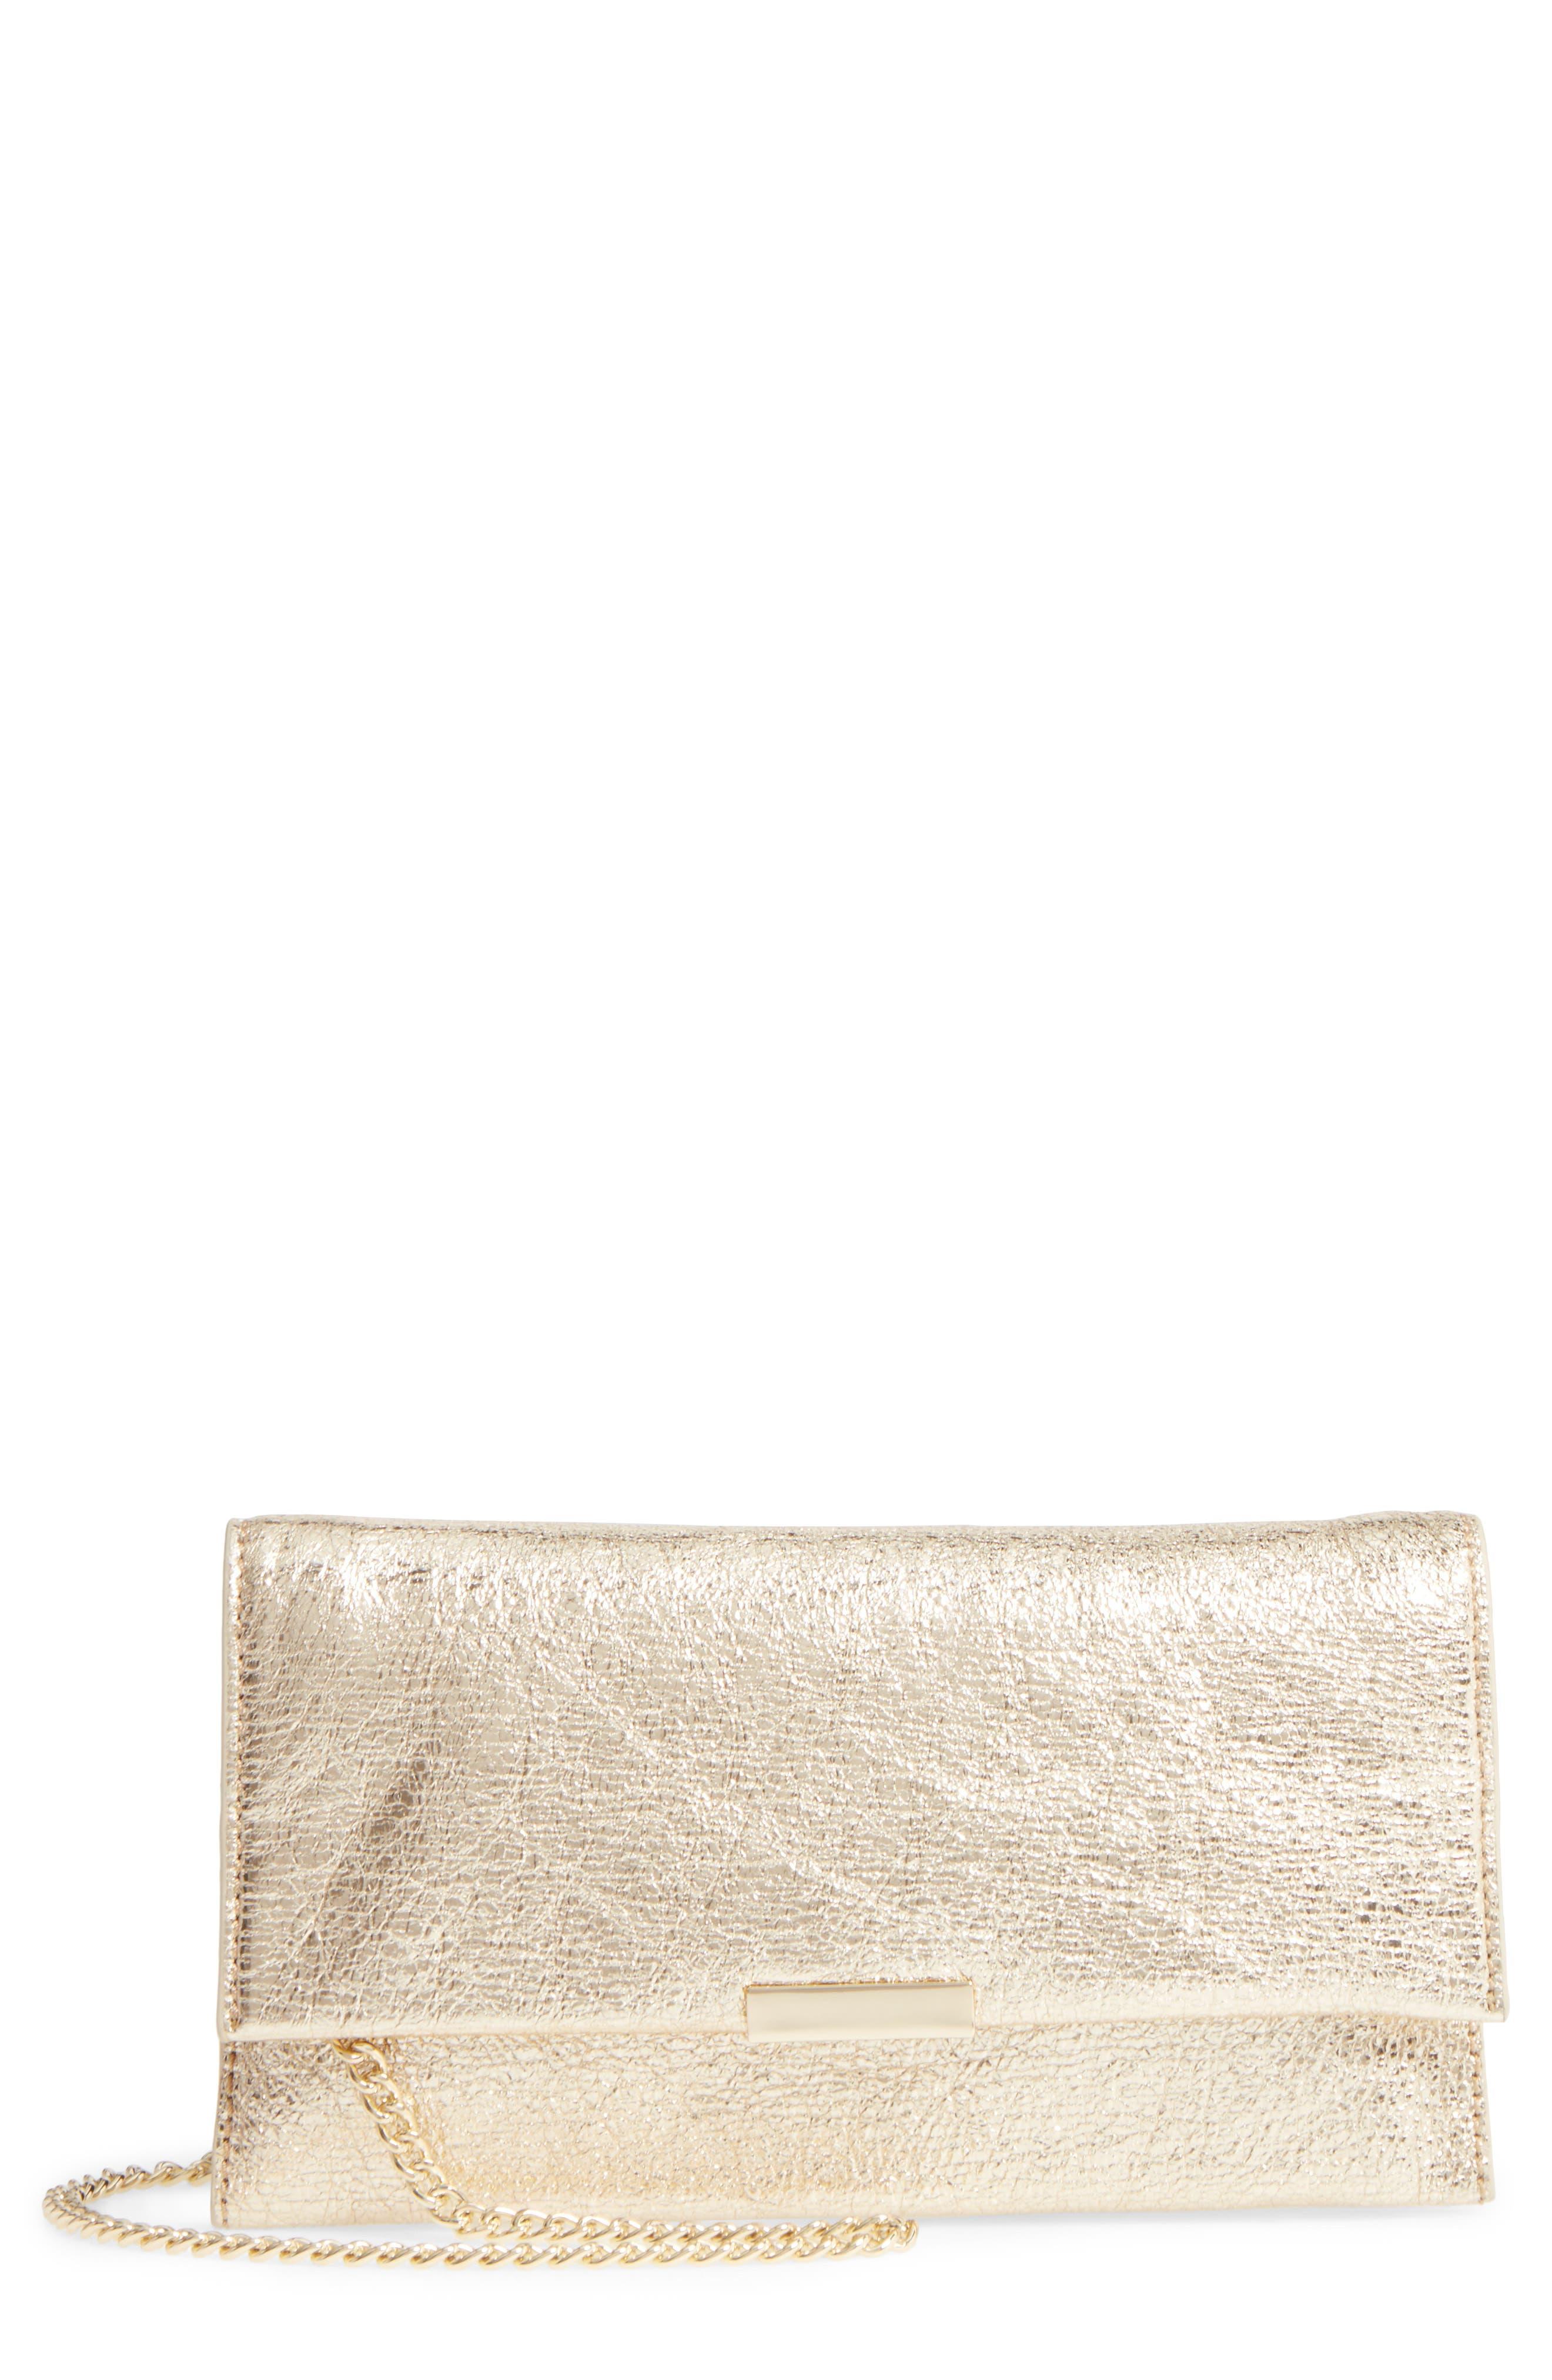 Main Image - Loeffler Randall Metallic Leather Tab Clutch